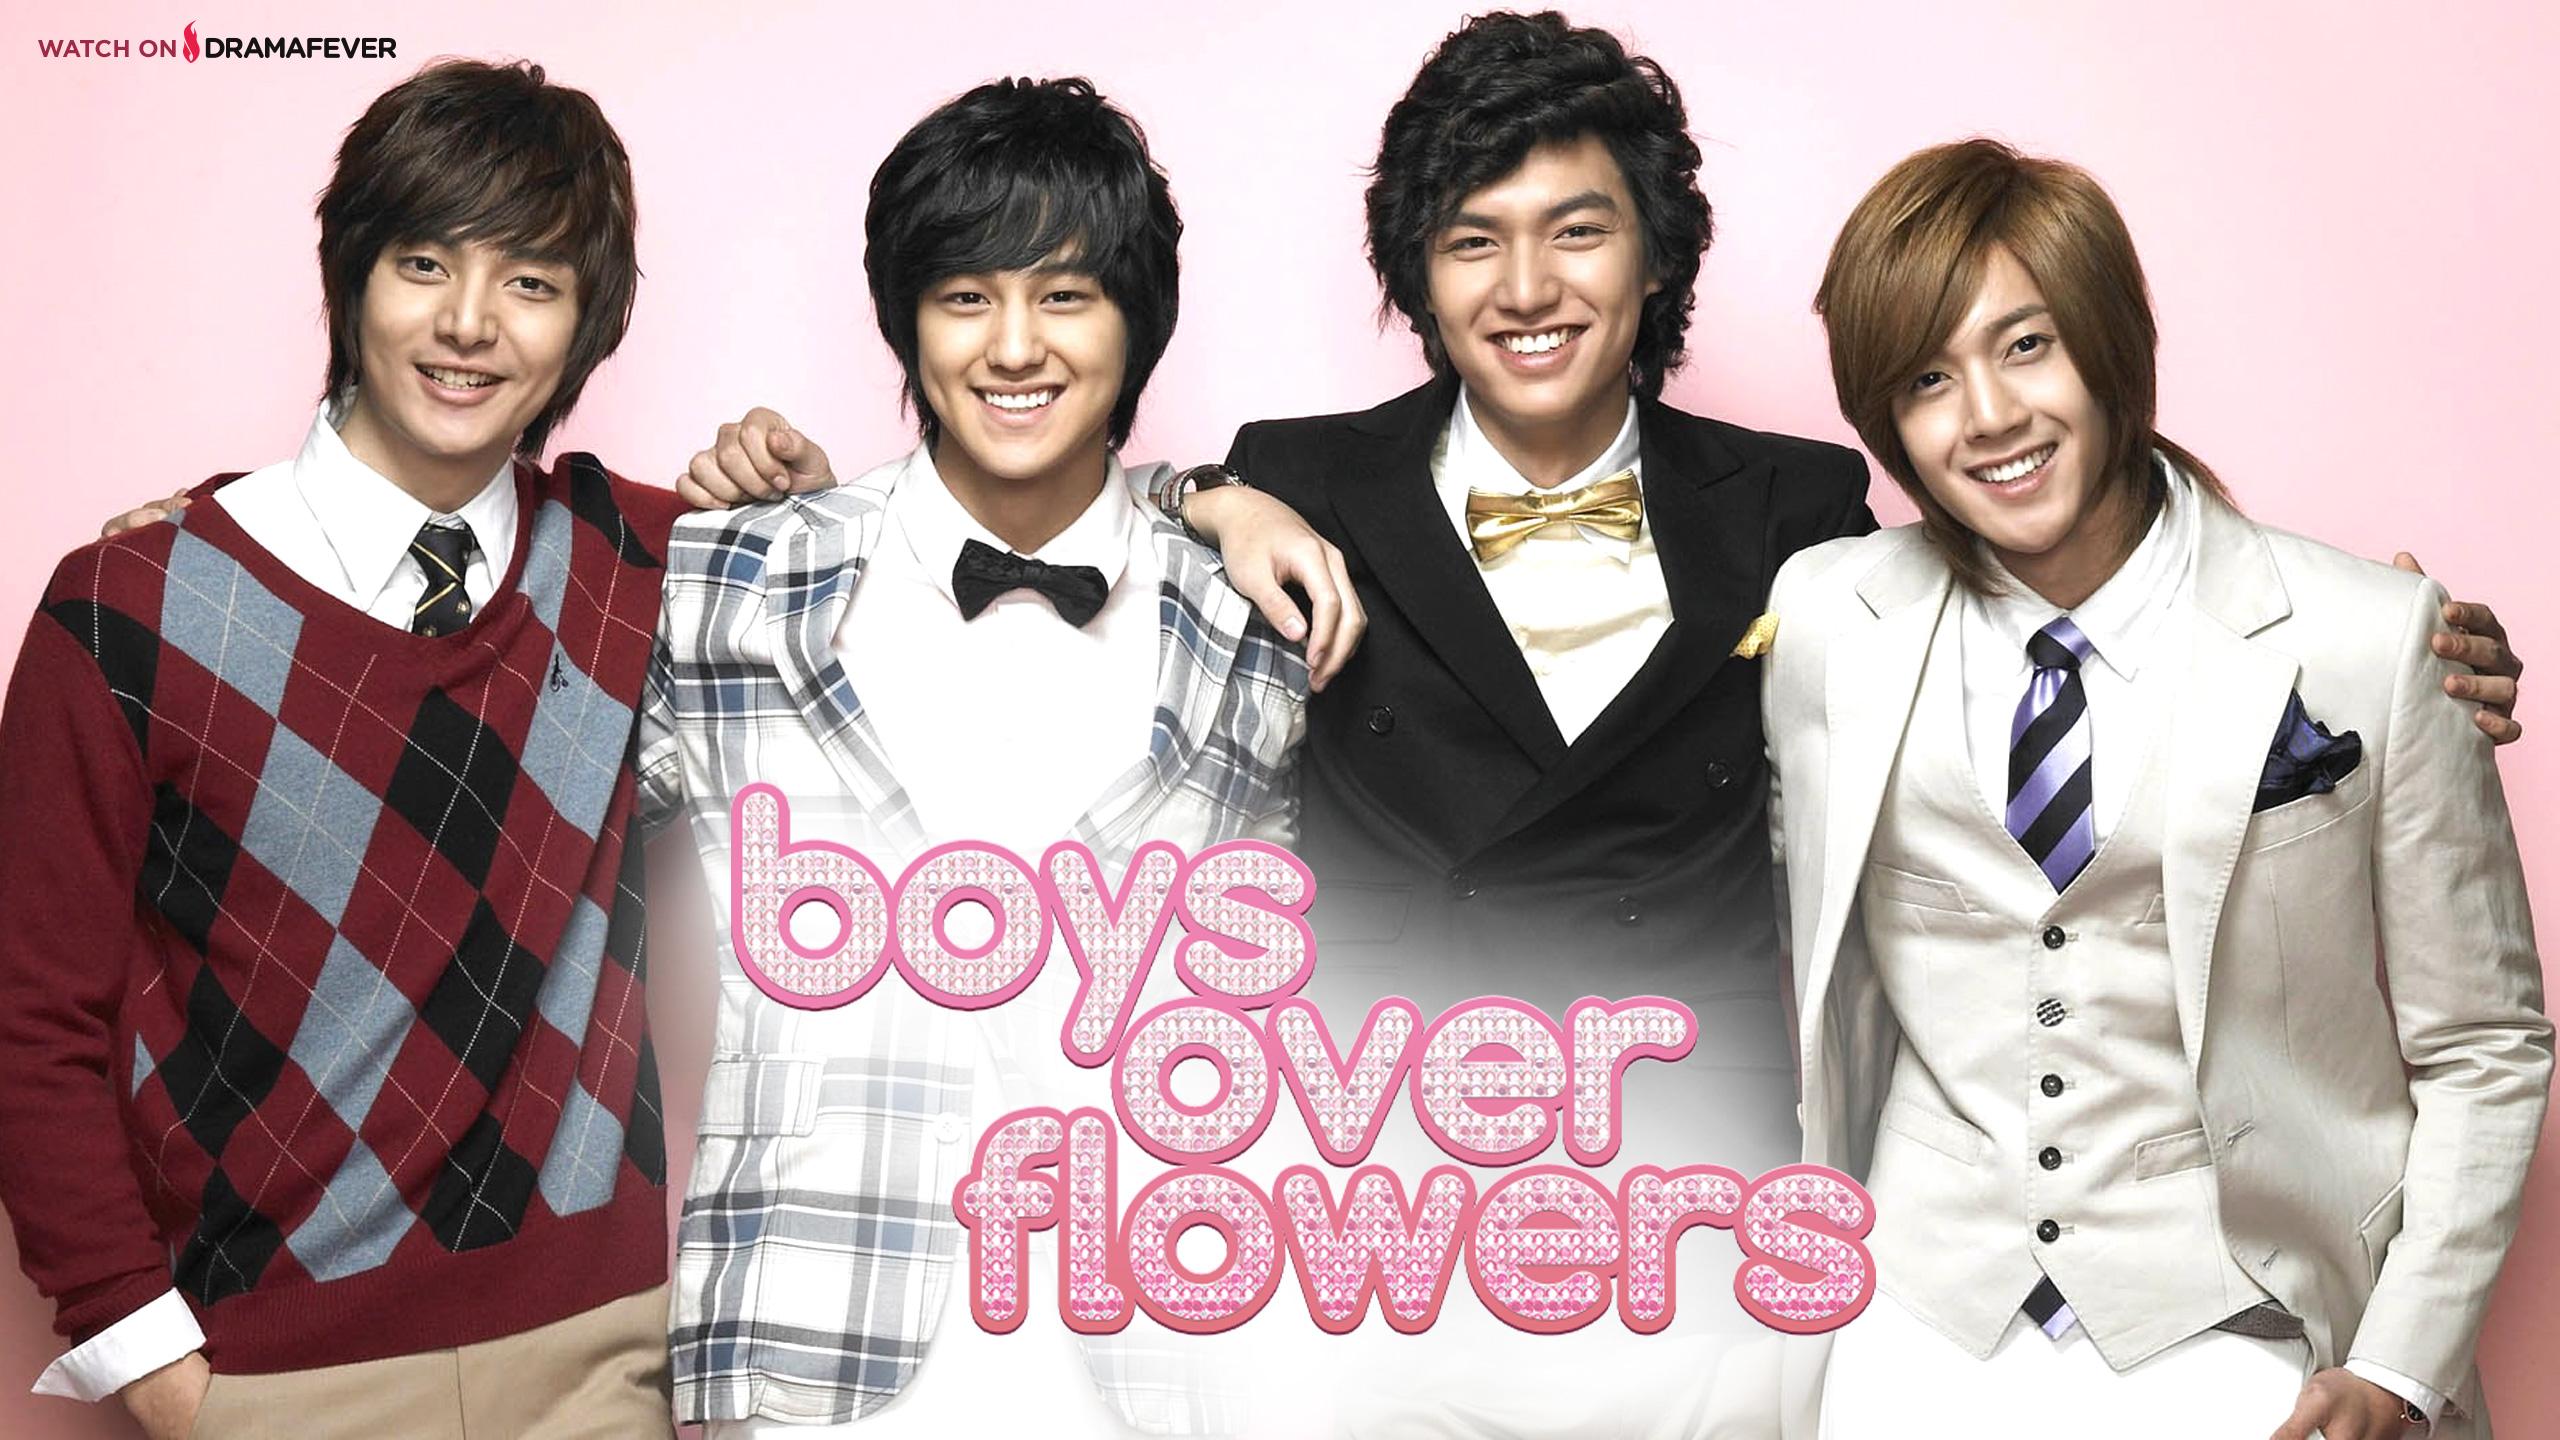 Download Boys Over Flowers wallpapers for your desktop iPhone iPad 2560x1440